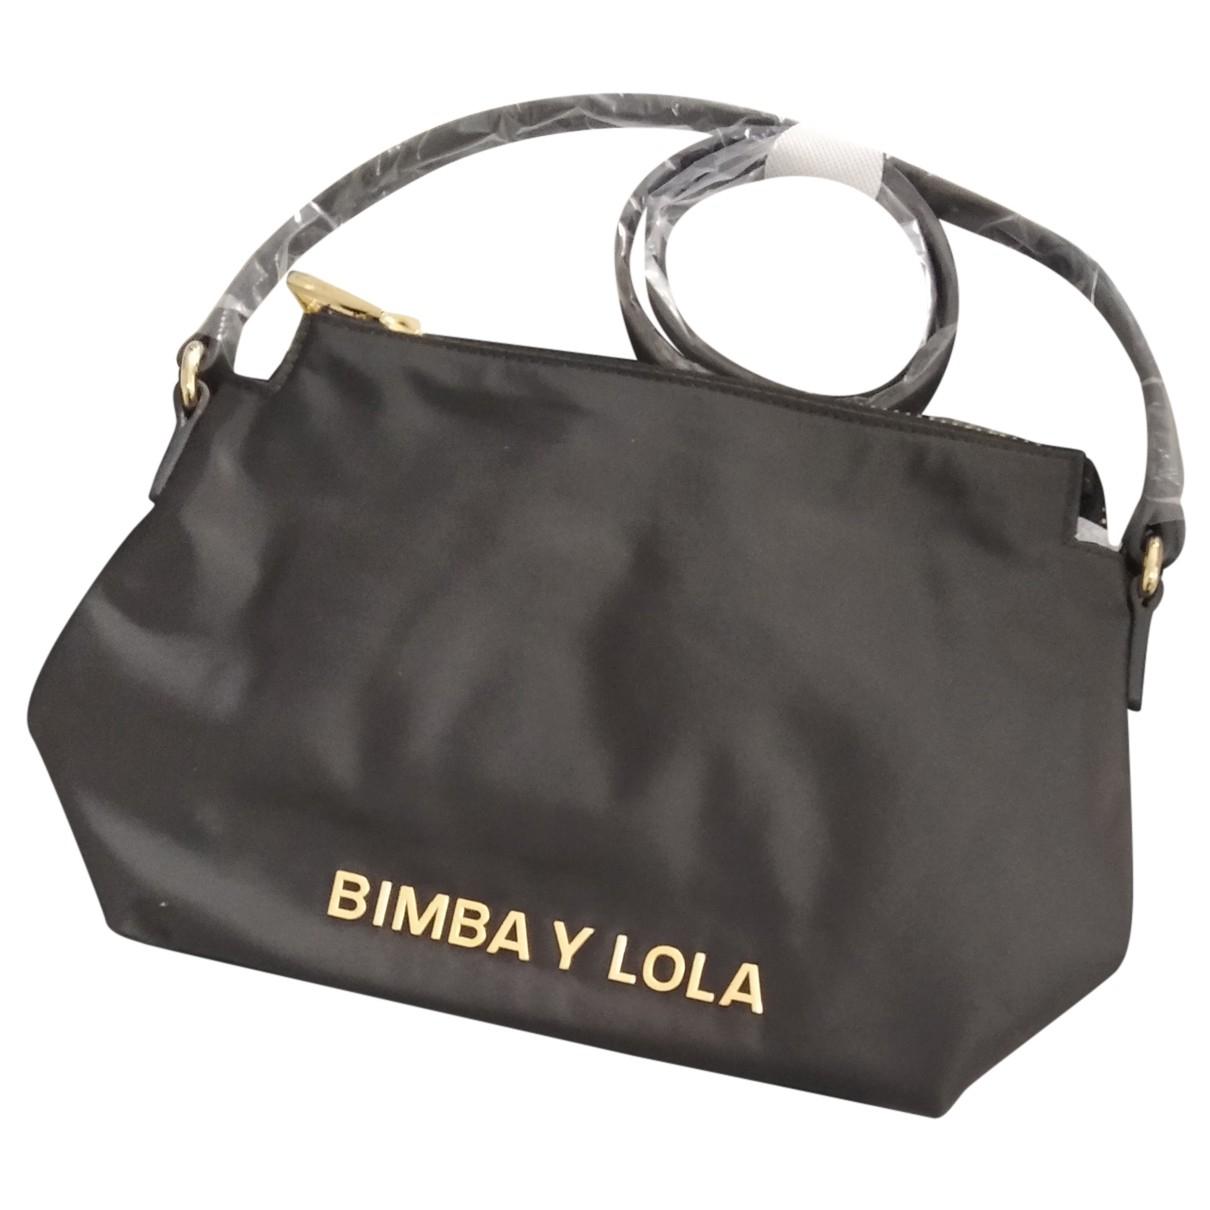 Bandolera Bimba Y Lola